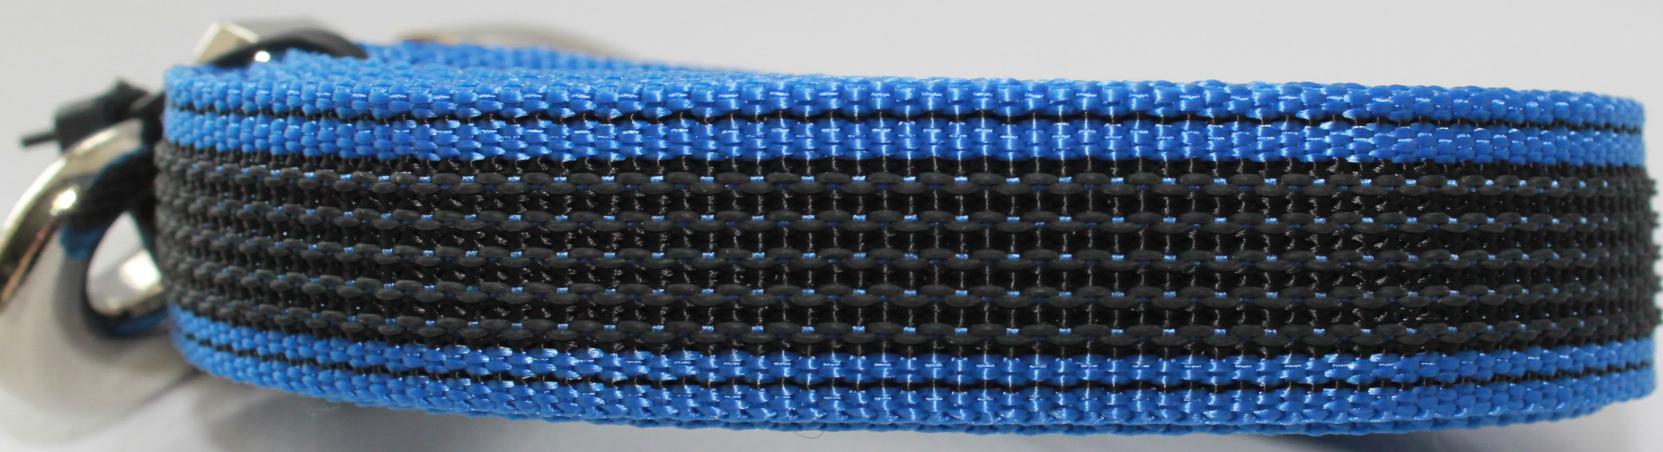 Поводок для собак Happy Friends, нескользящий, цвет: синий, ширина 2 см, длина 1,20 м поводок для собак happy friends нескользящий цвет синий ширина 2 см длина 2 м